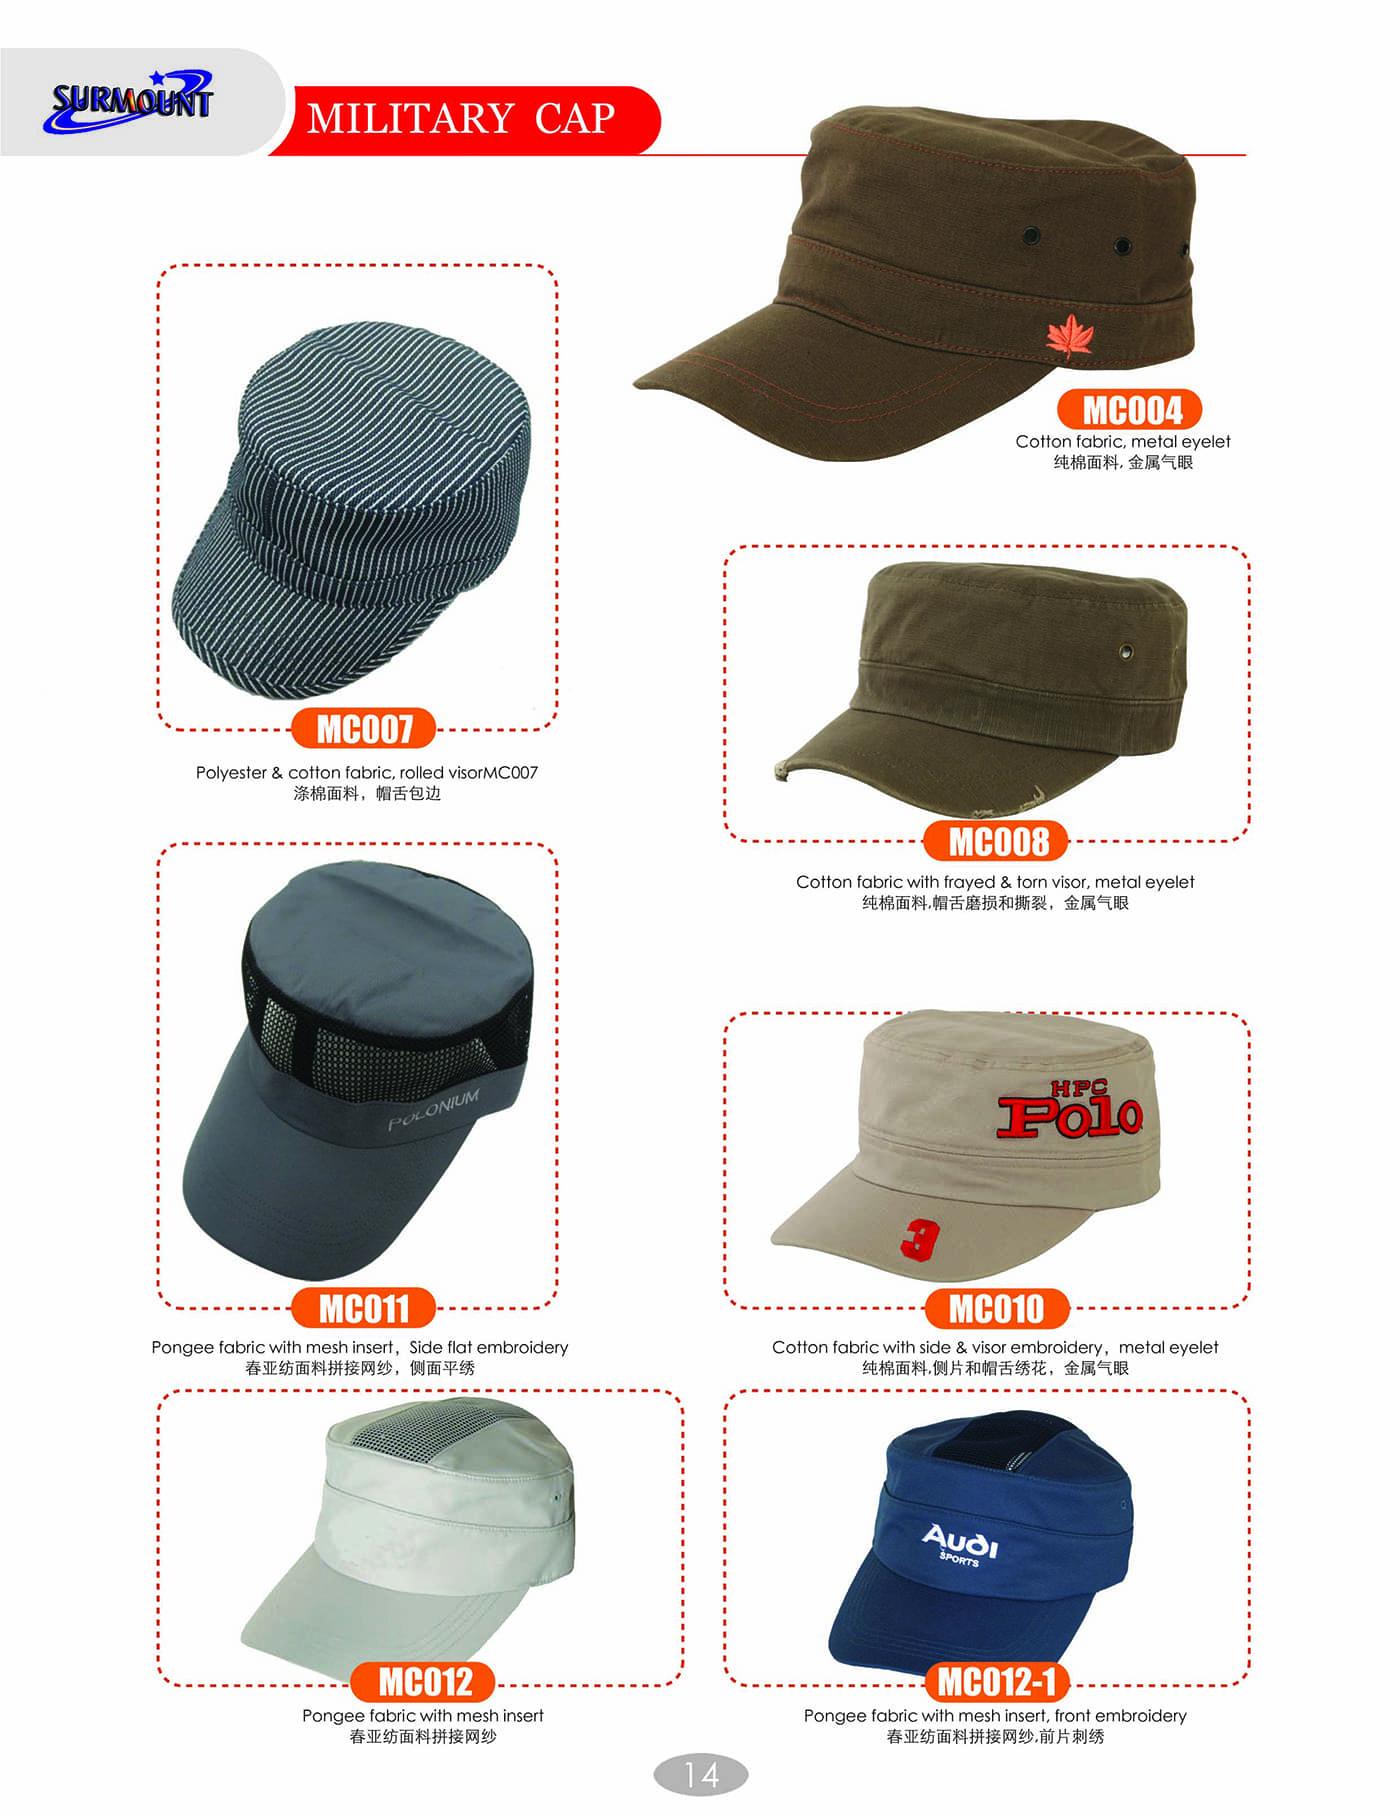 Military Caps (2)